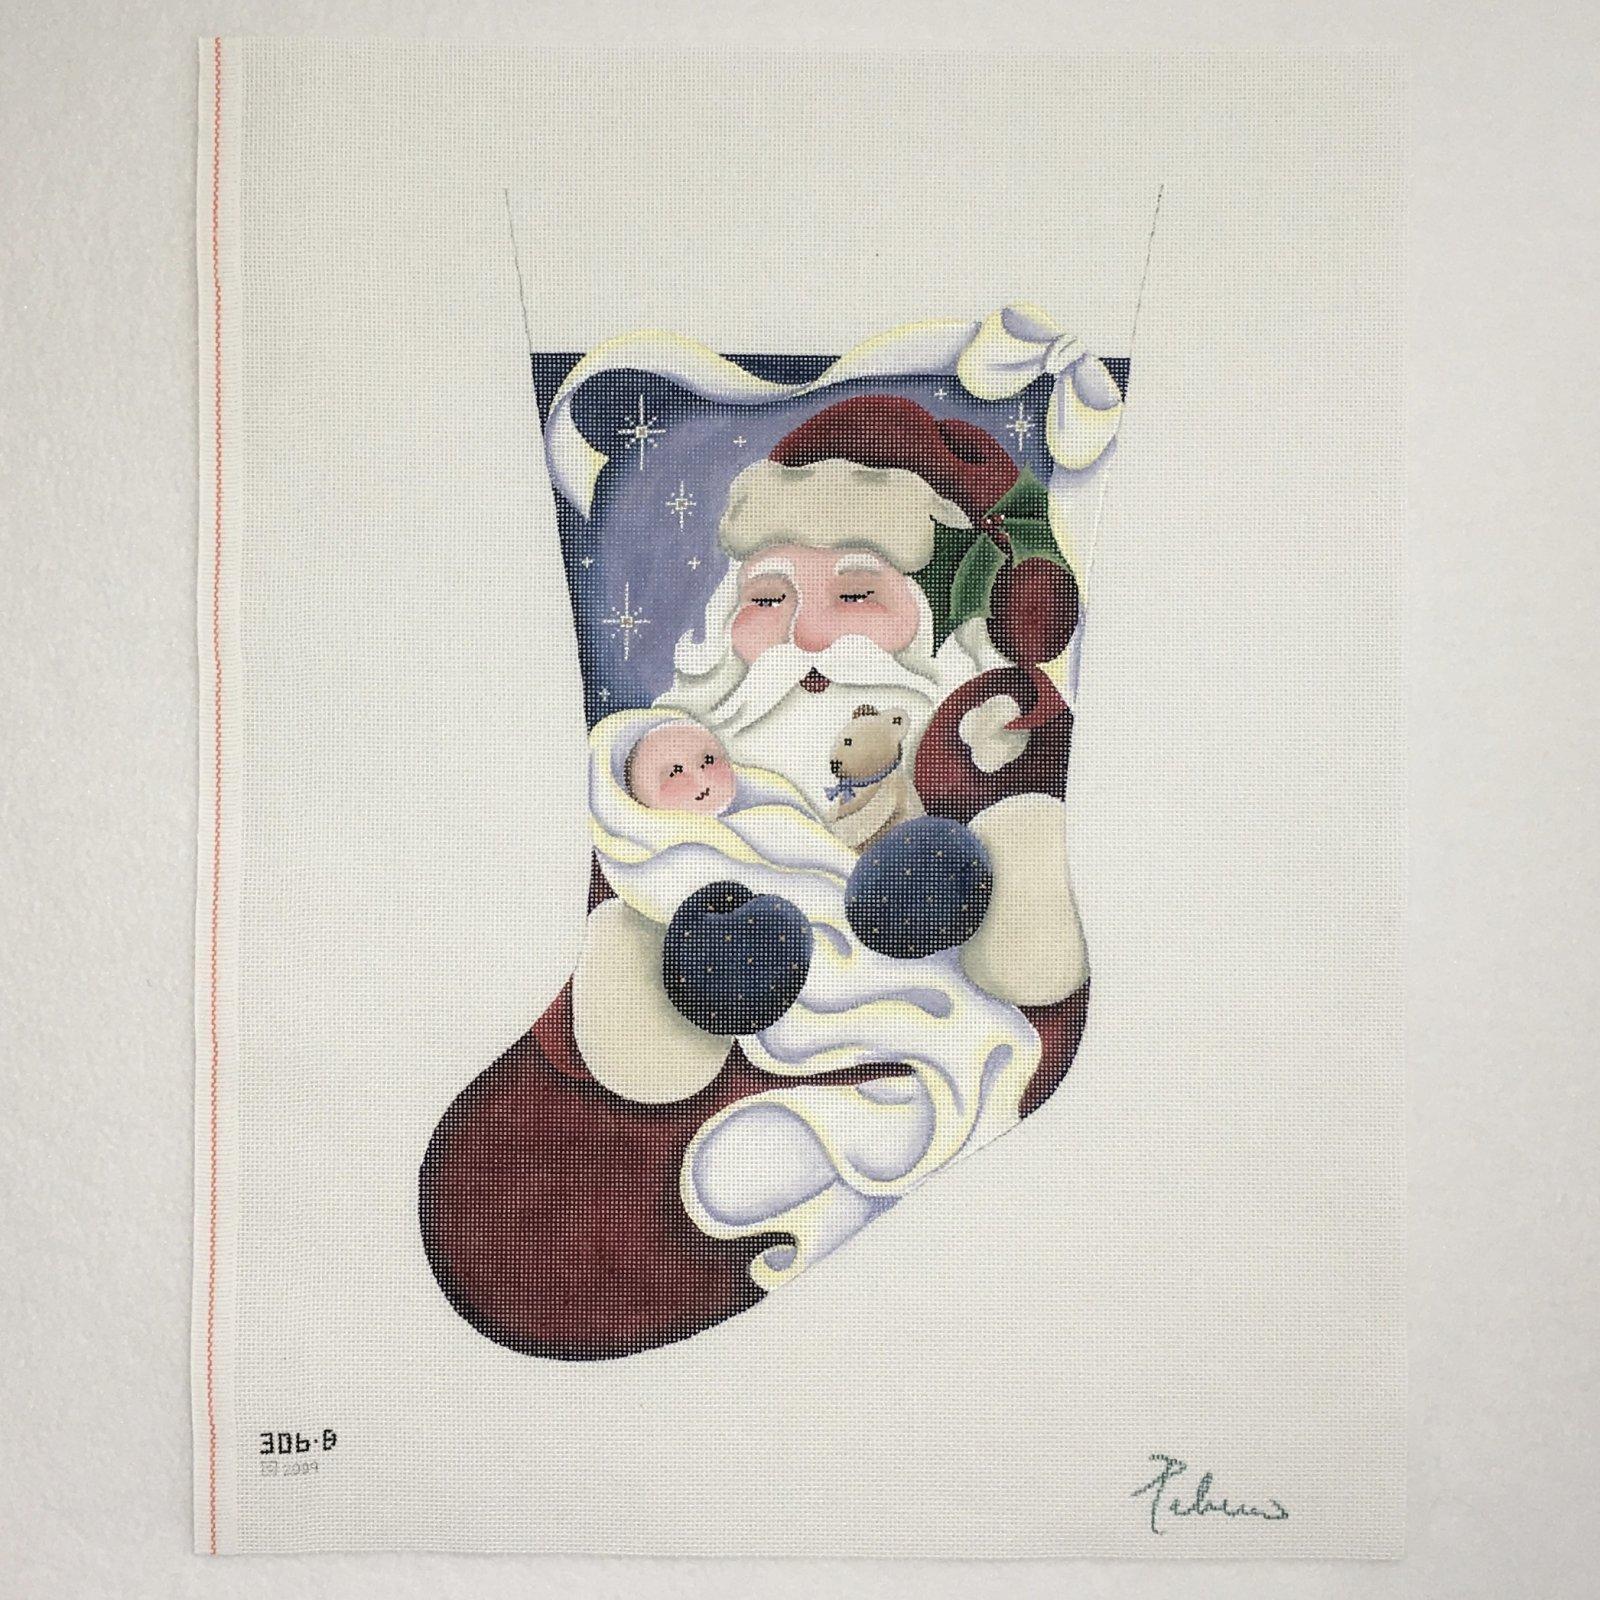 306B Baby's First Boy Stocking